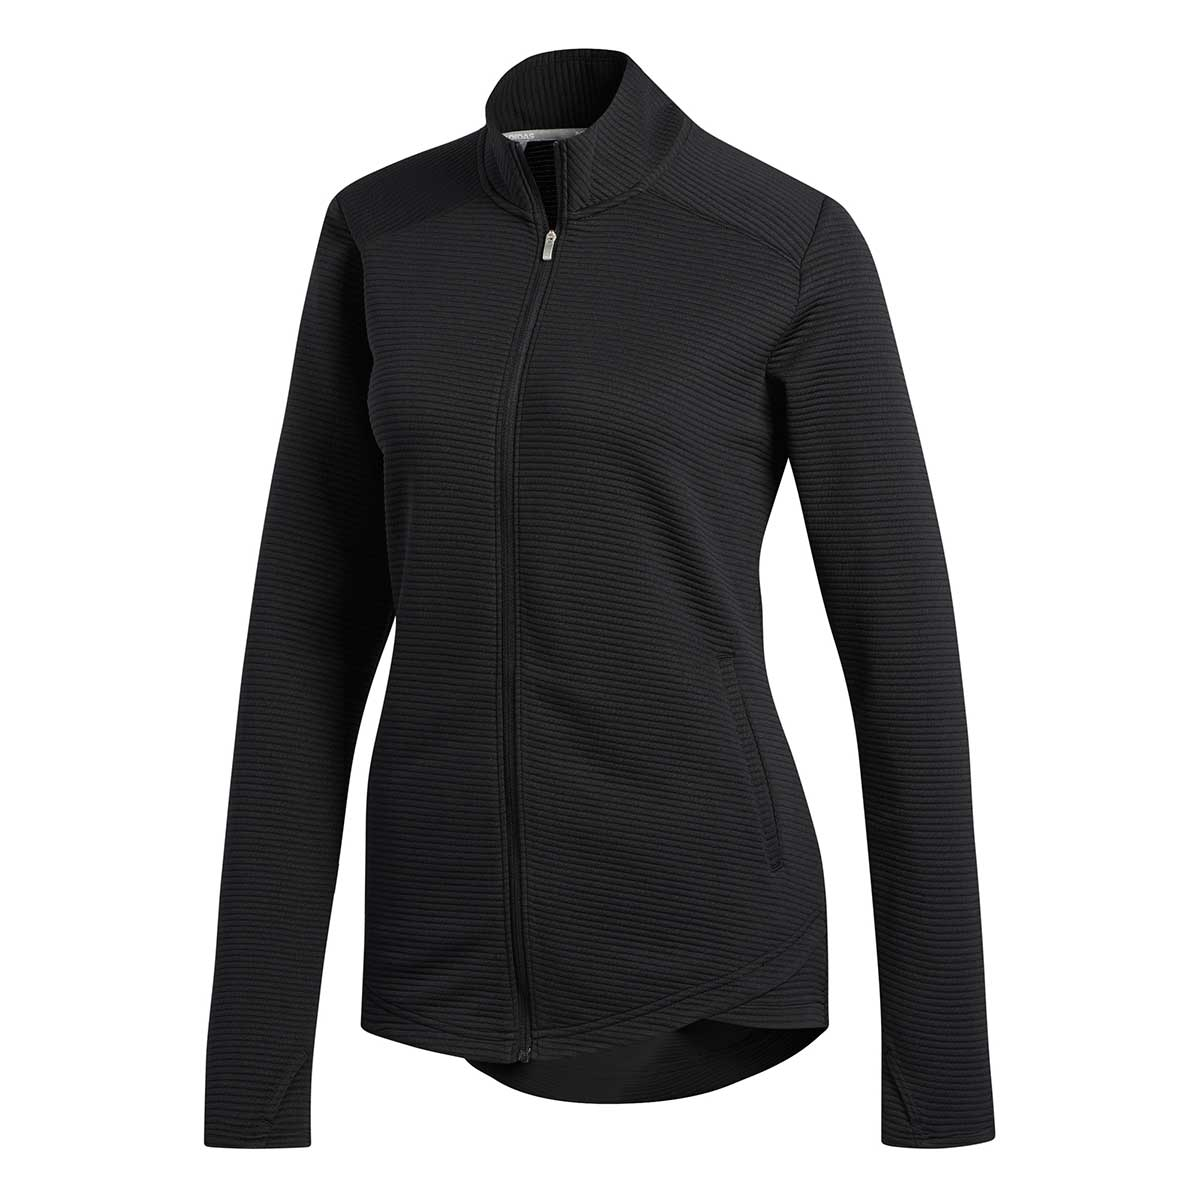 Adidas Women's Essentials Full Zip Black Jacket